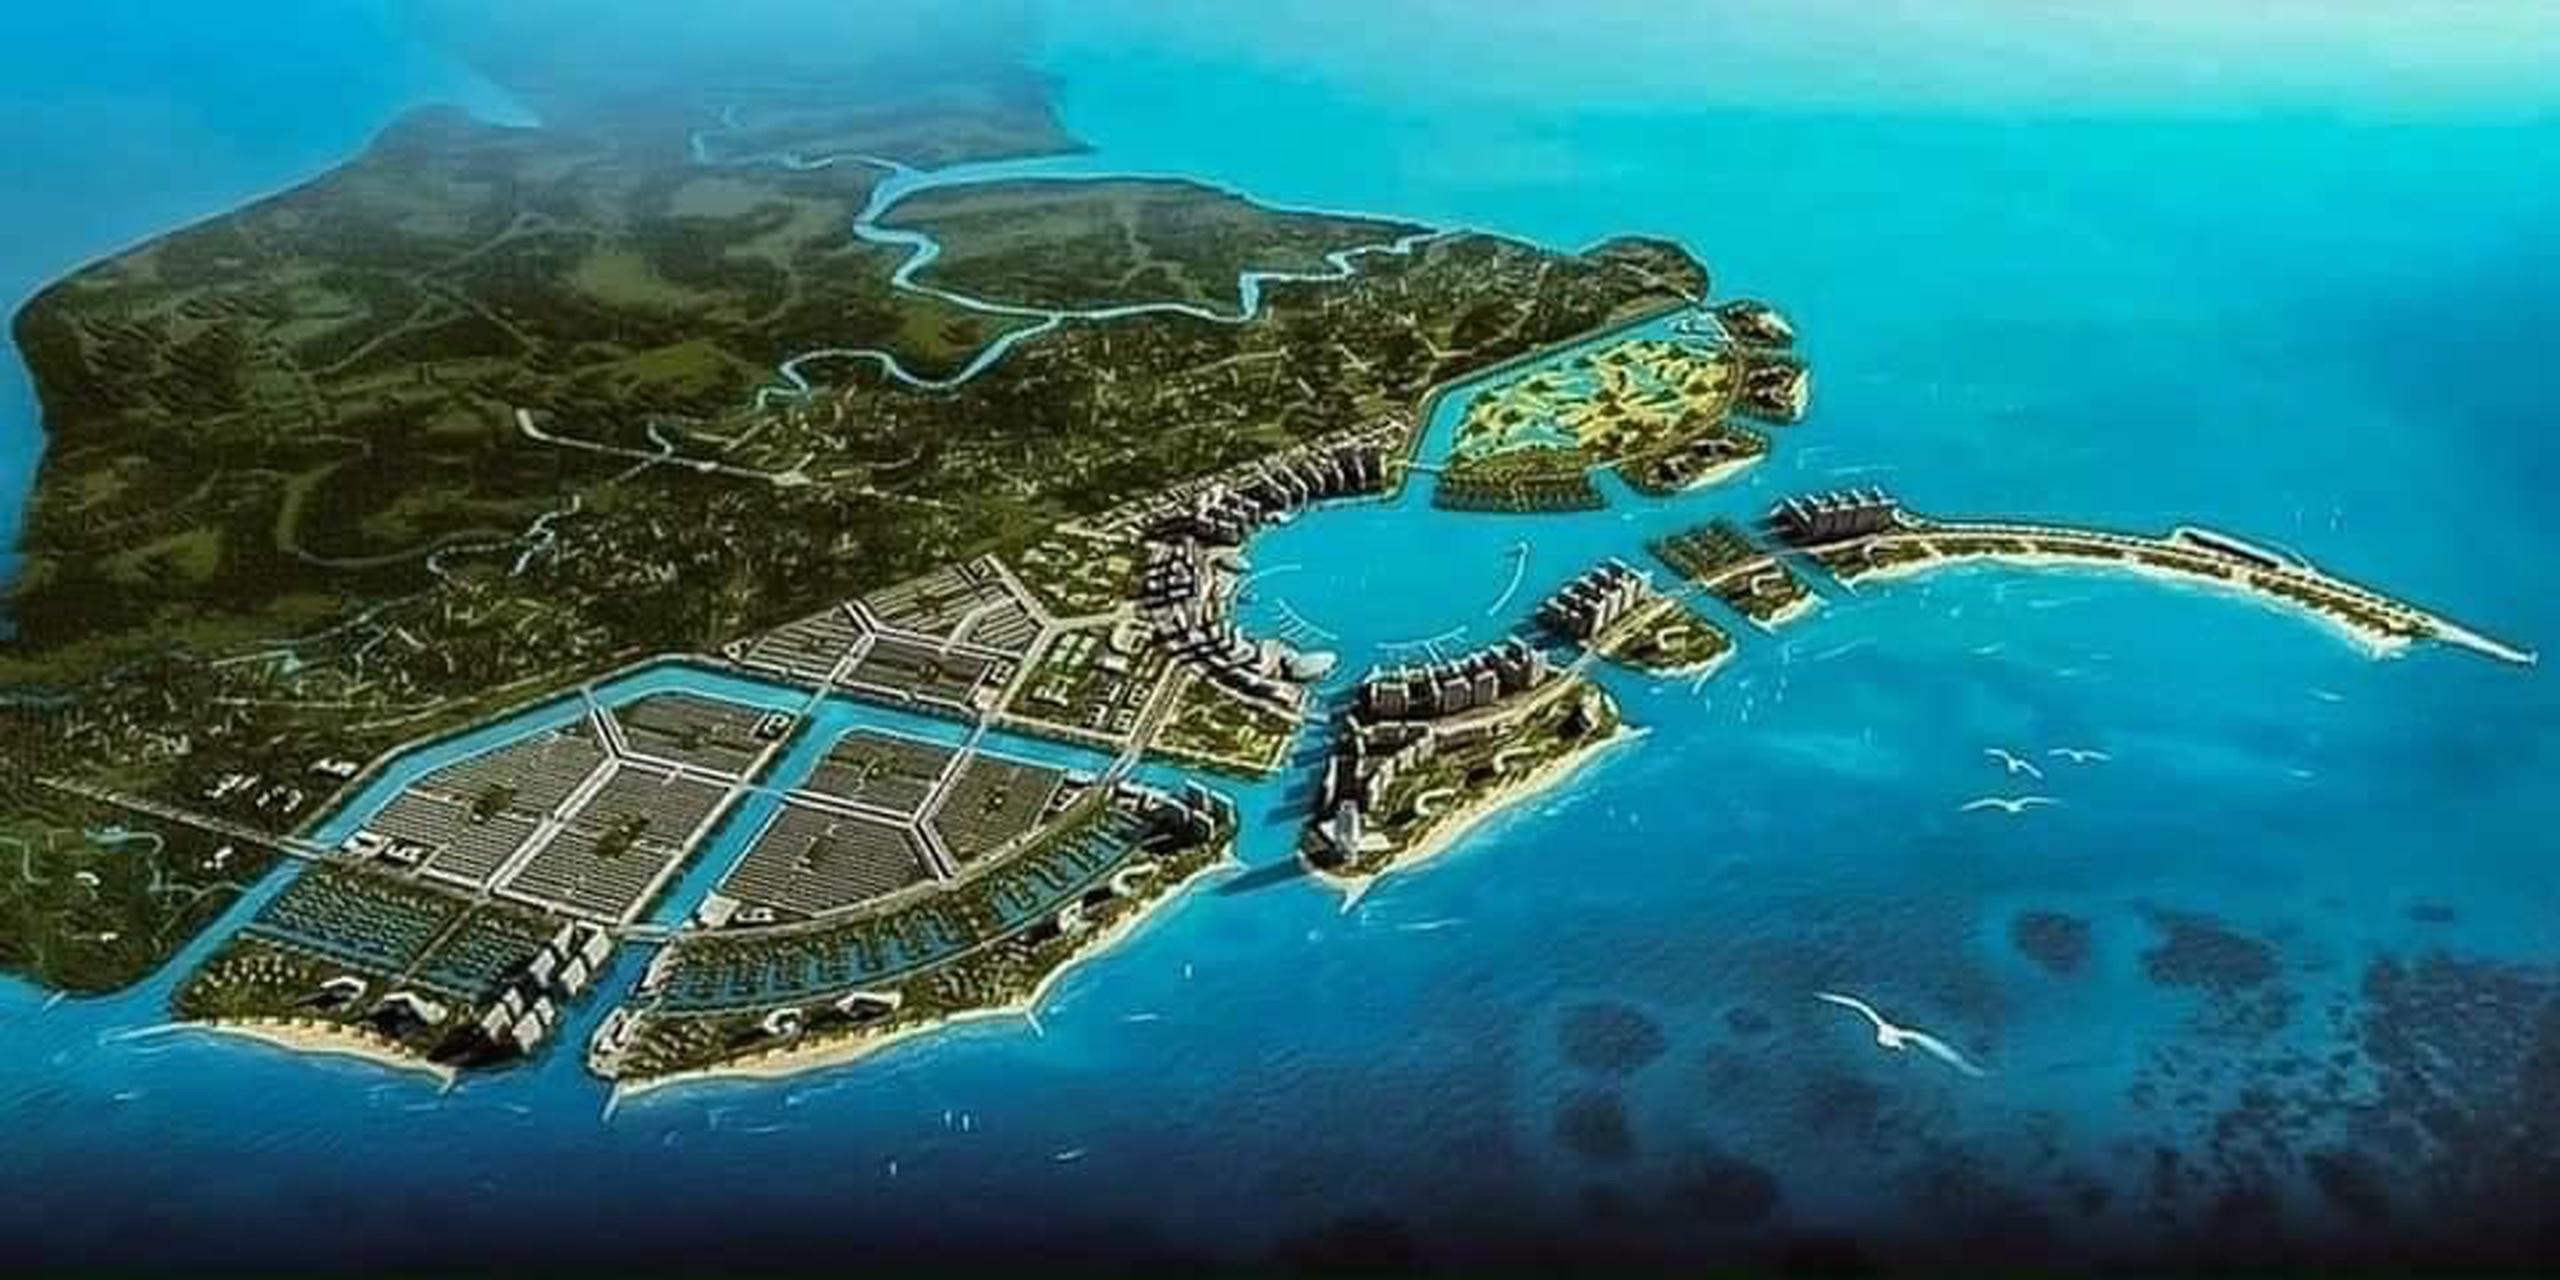 Kế hoạch Vinhomes, Nam Long, Novaland, Sunwha, Sunshine Group phát triển bds